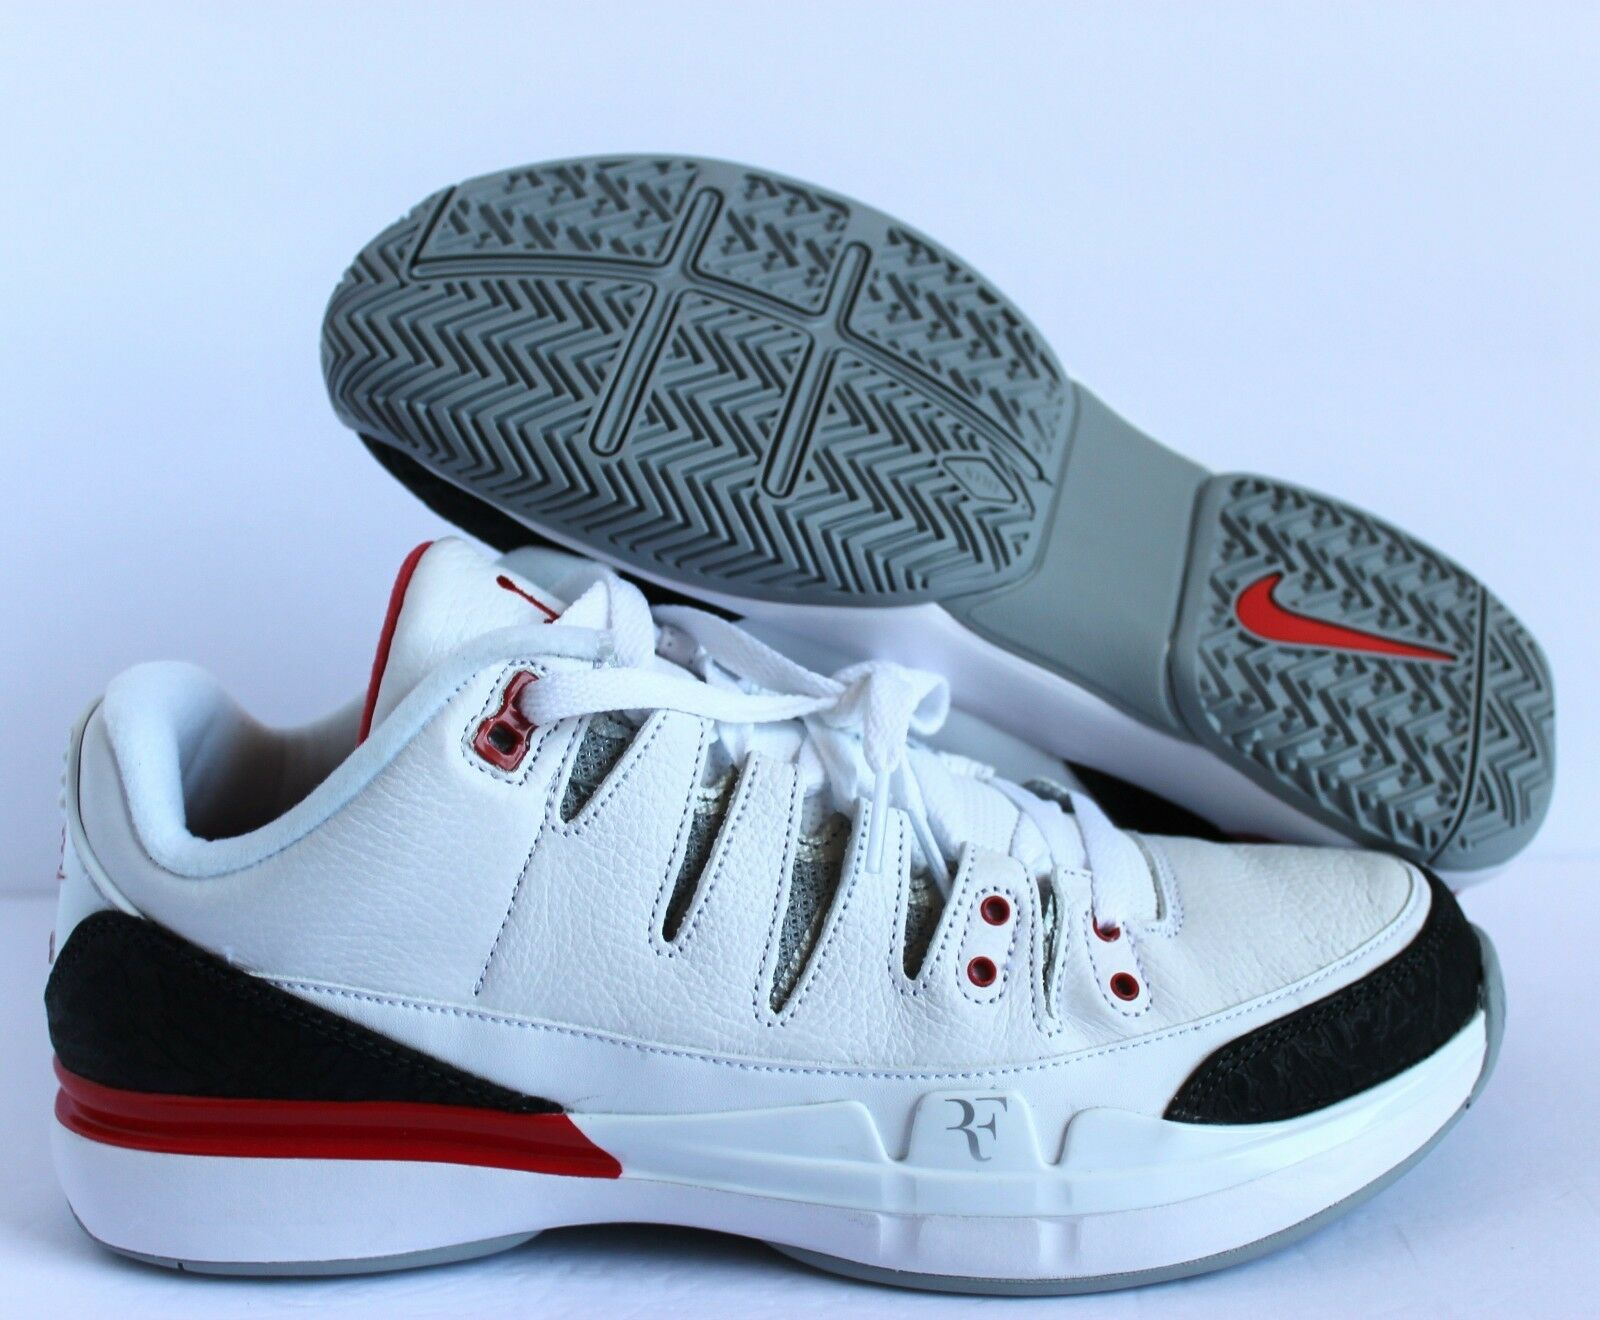 Nike x aj3 zoom vapore air jordan 3